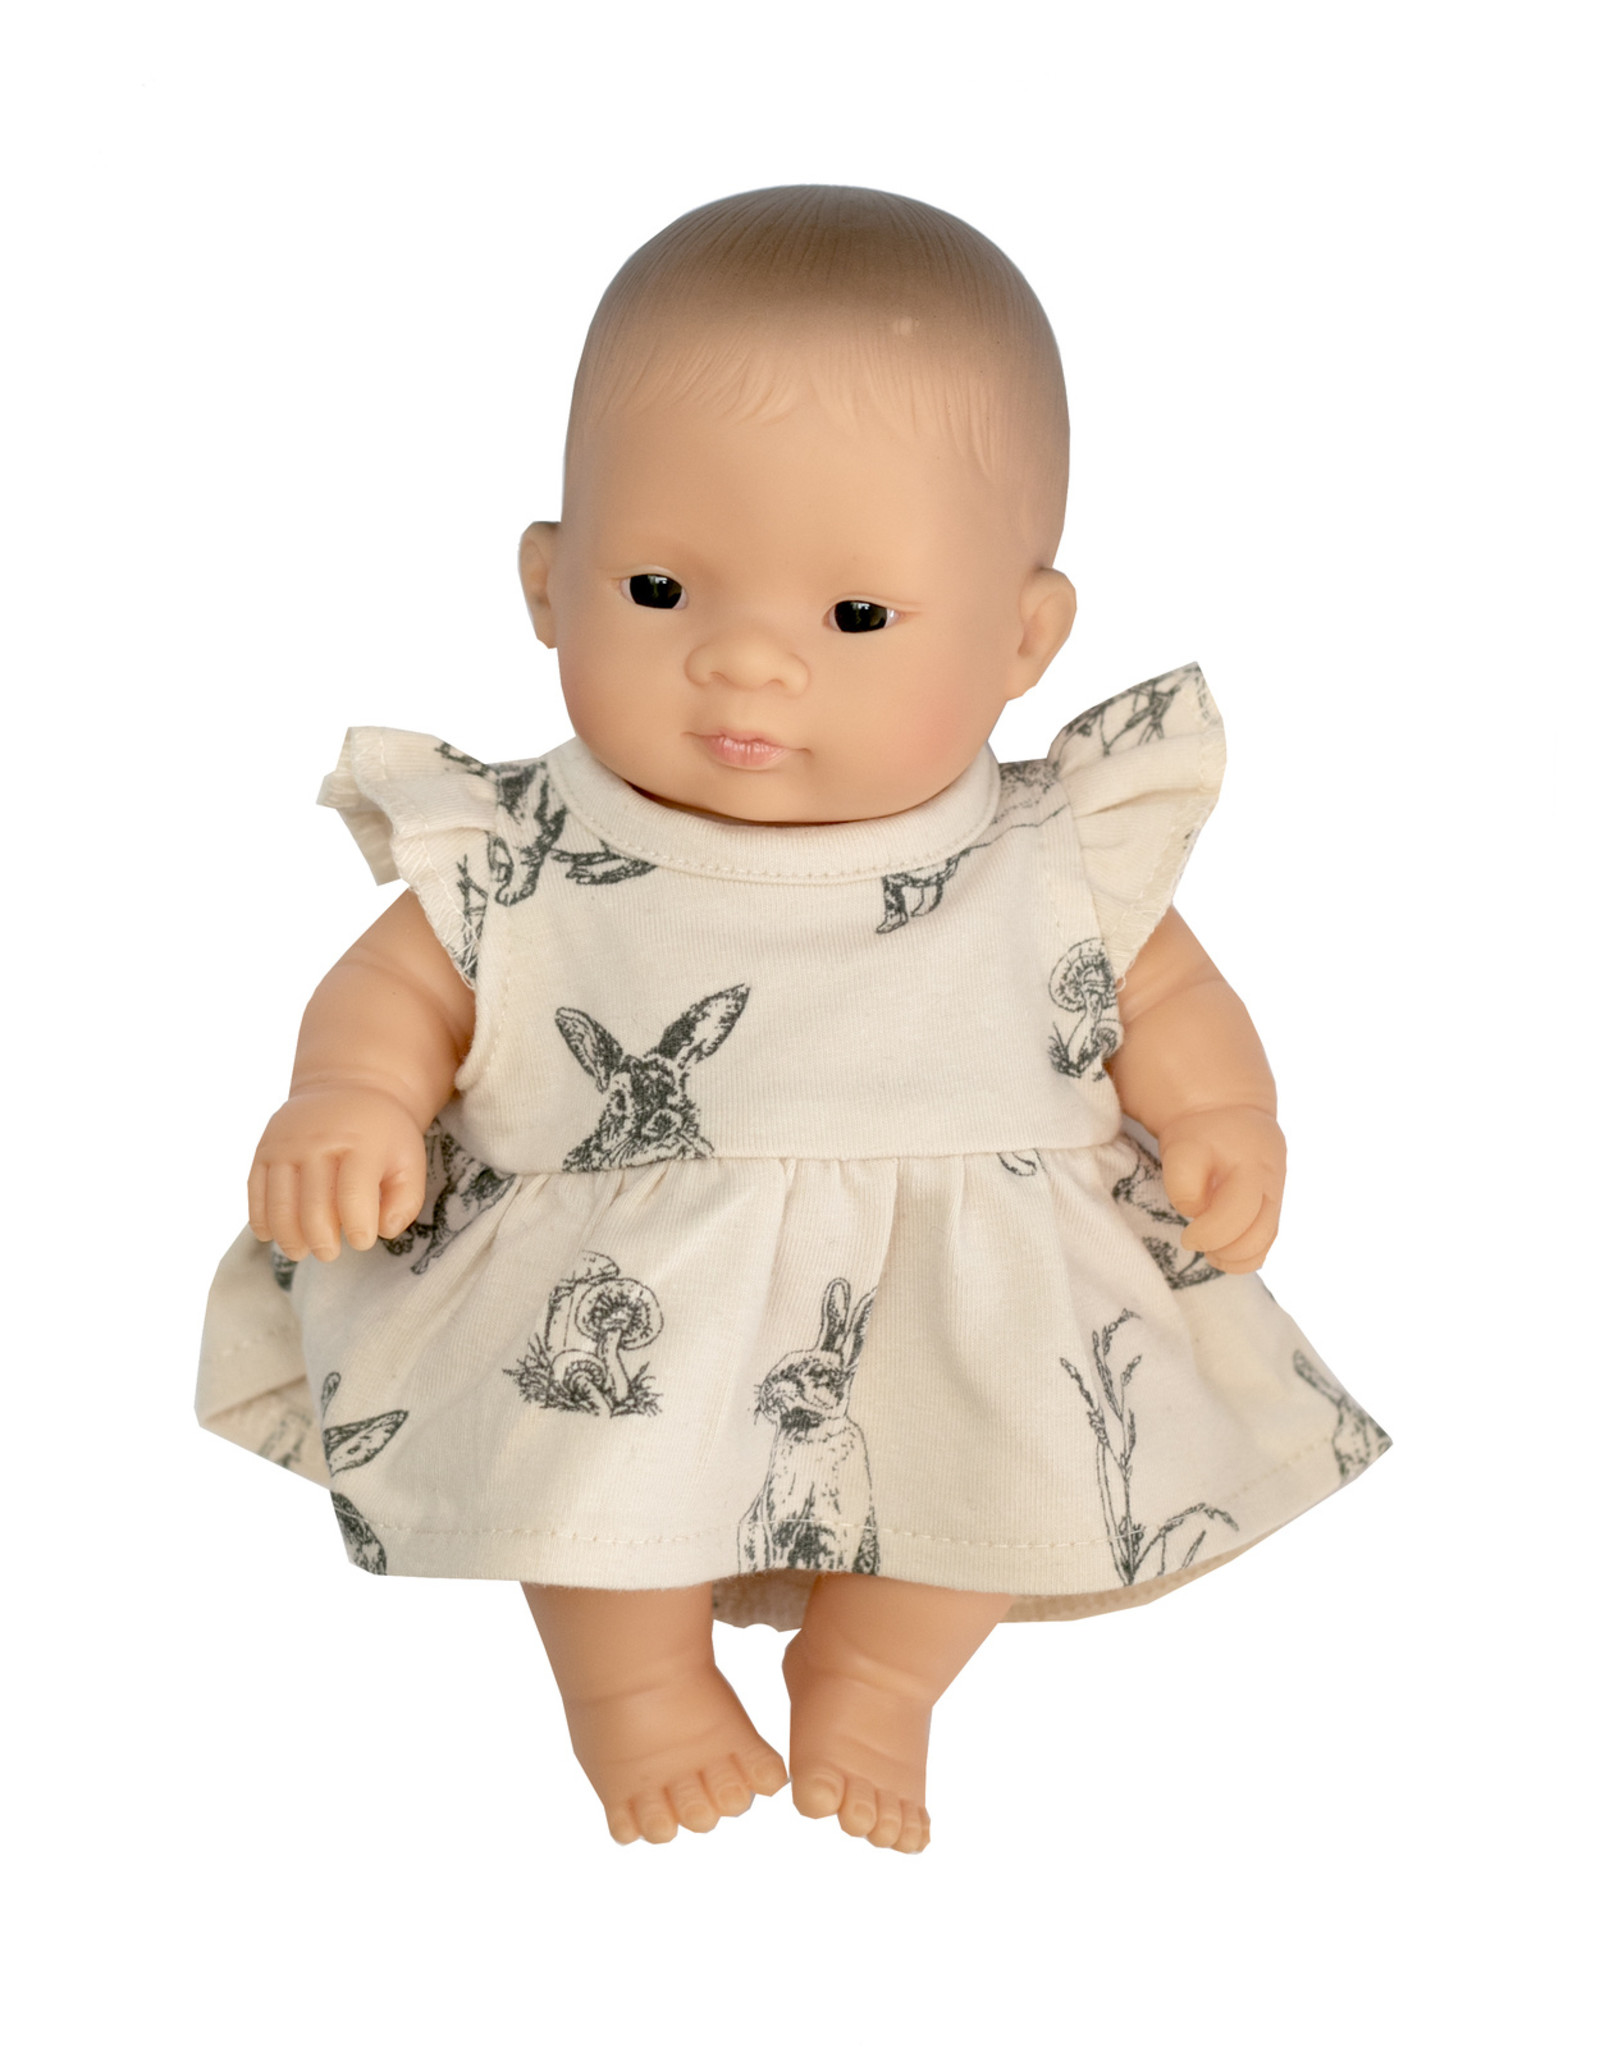 Burrow & Be Burrow & Be - Almond Burrowers Dolls Dress 21cm